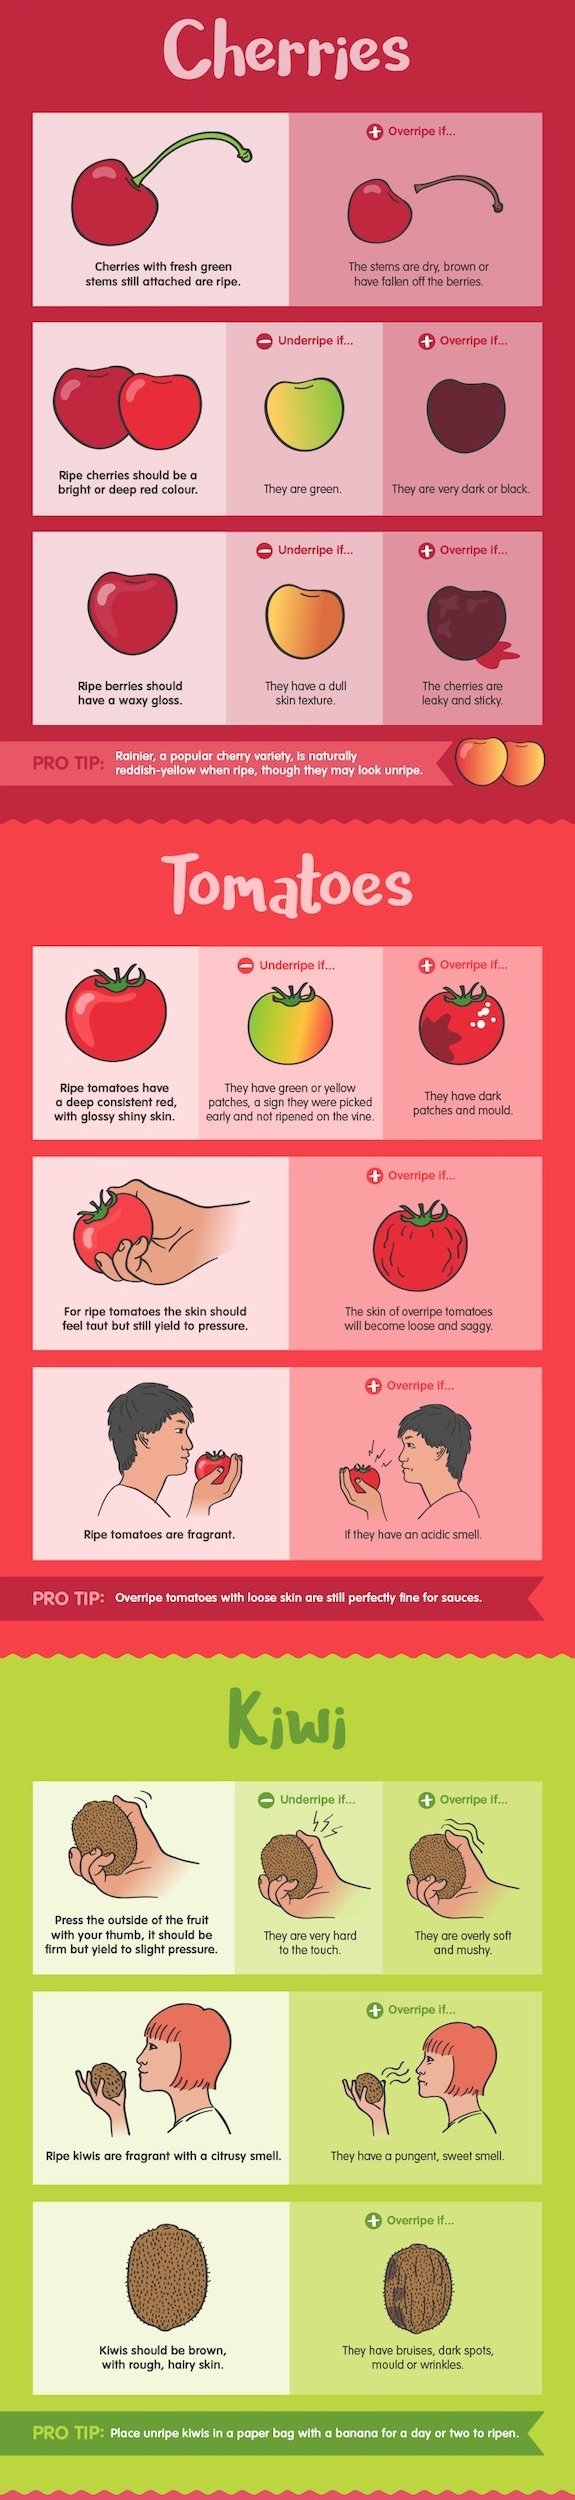 How to choose fresh tomatoes, cherries, and kiwi